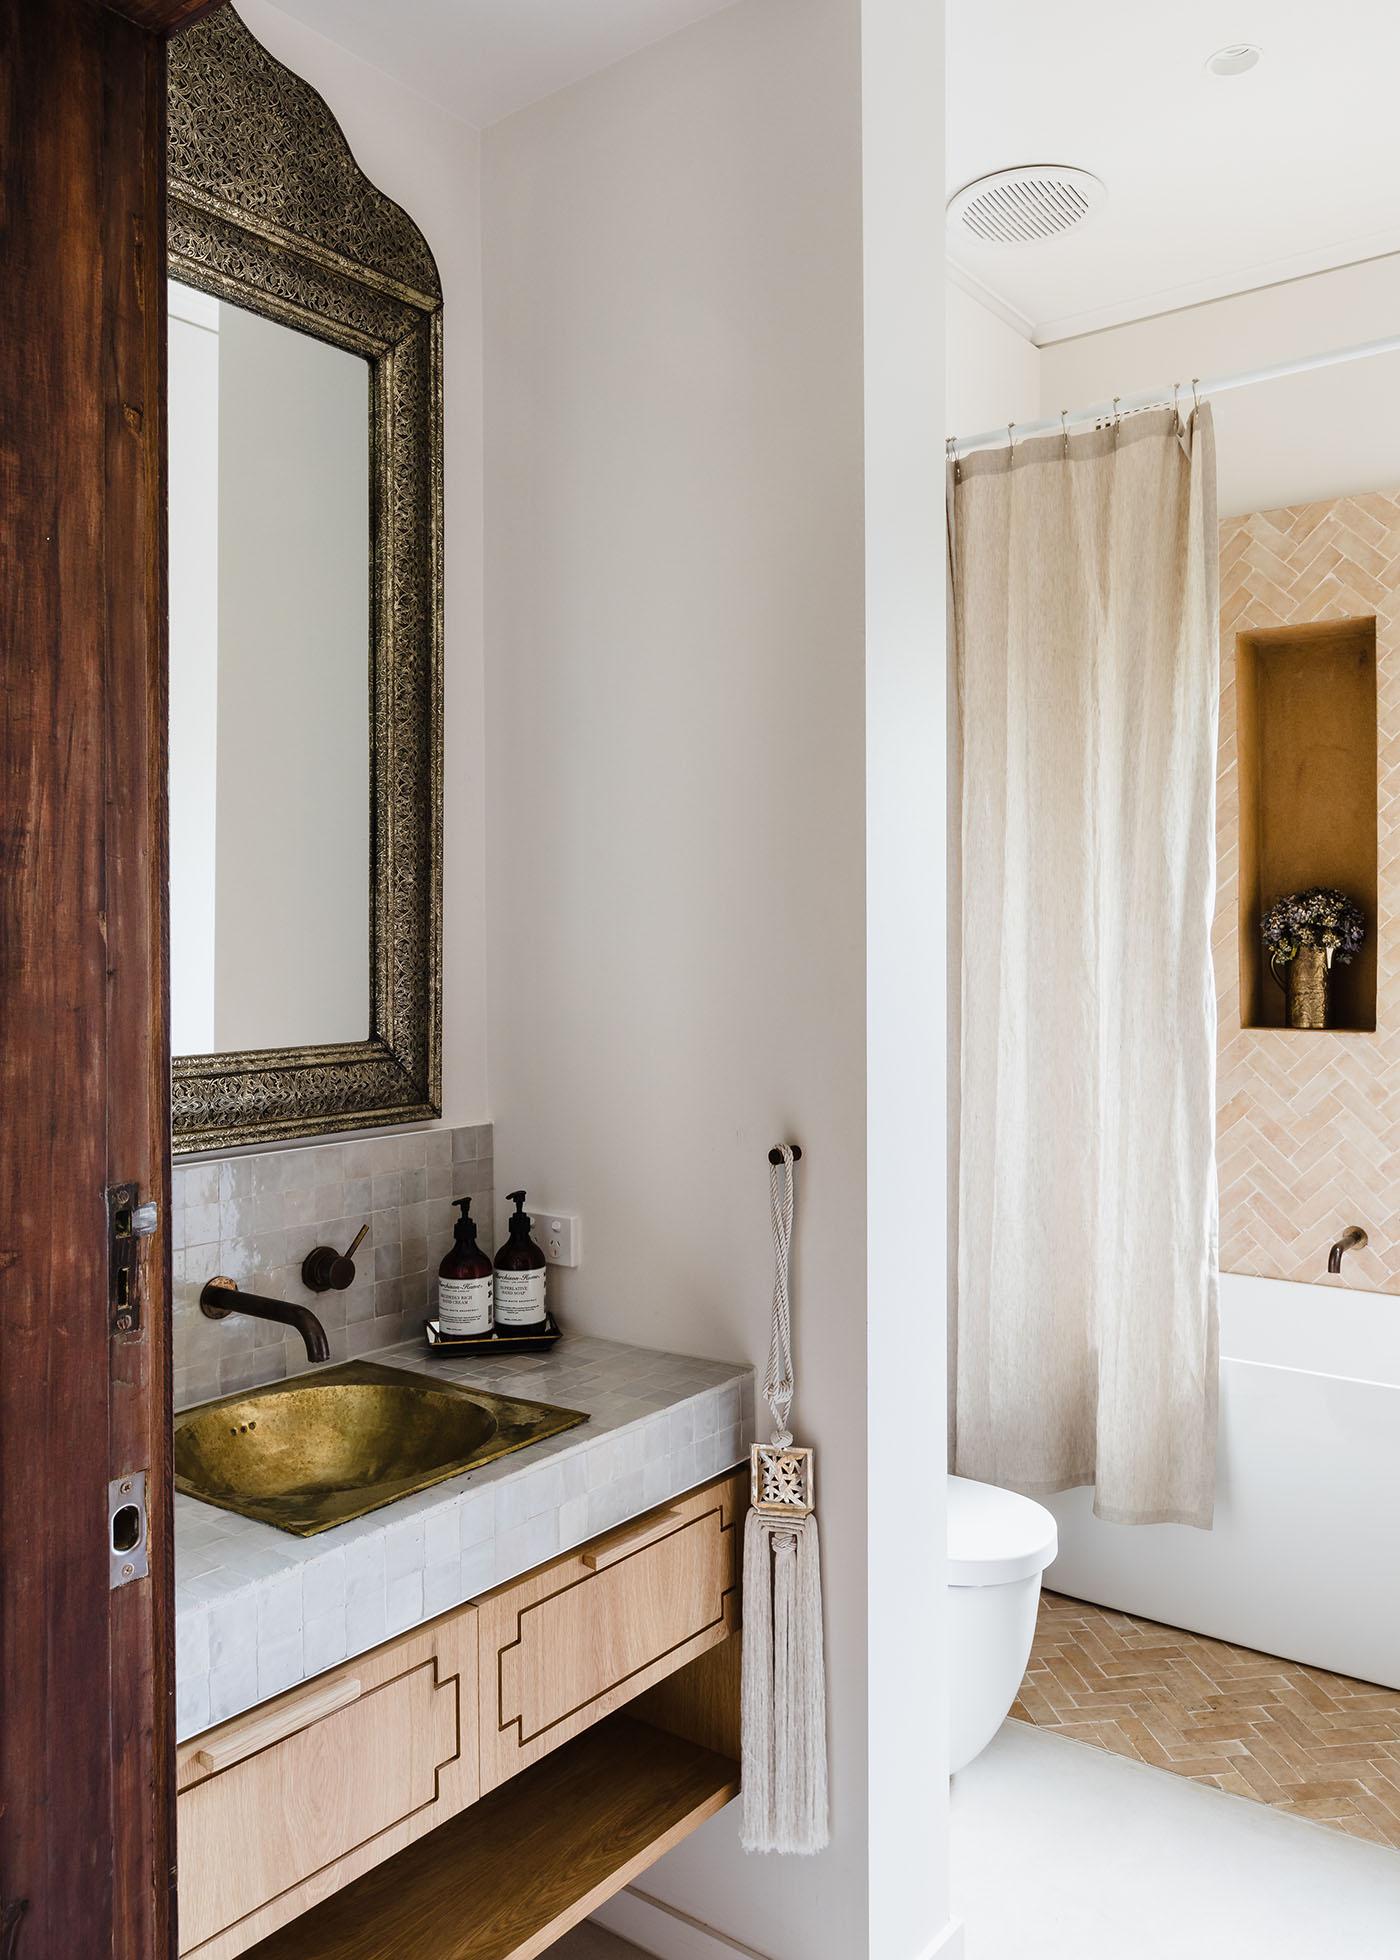 GABBE INTERIOR TILESOFEZRA Georgia Ezra Home Feature shower Mosaic Moroccan feature bathroom wall tile.jpg